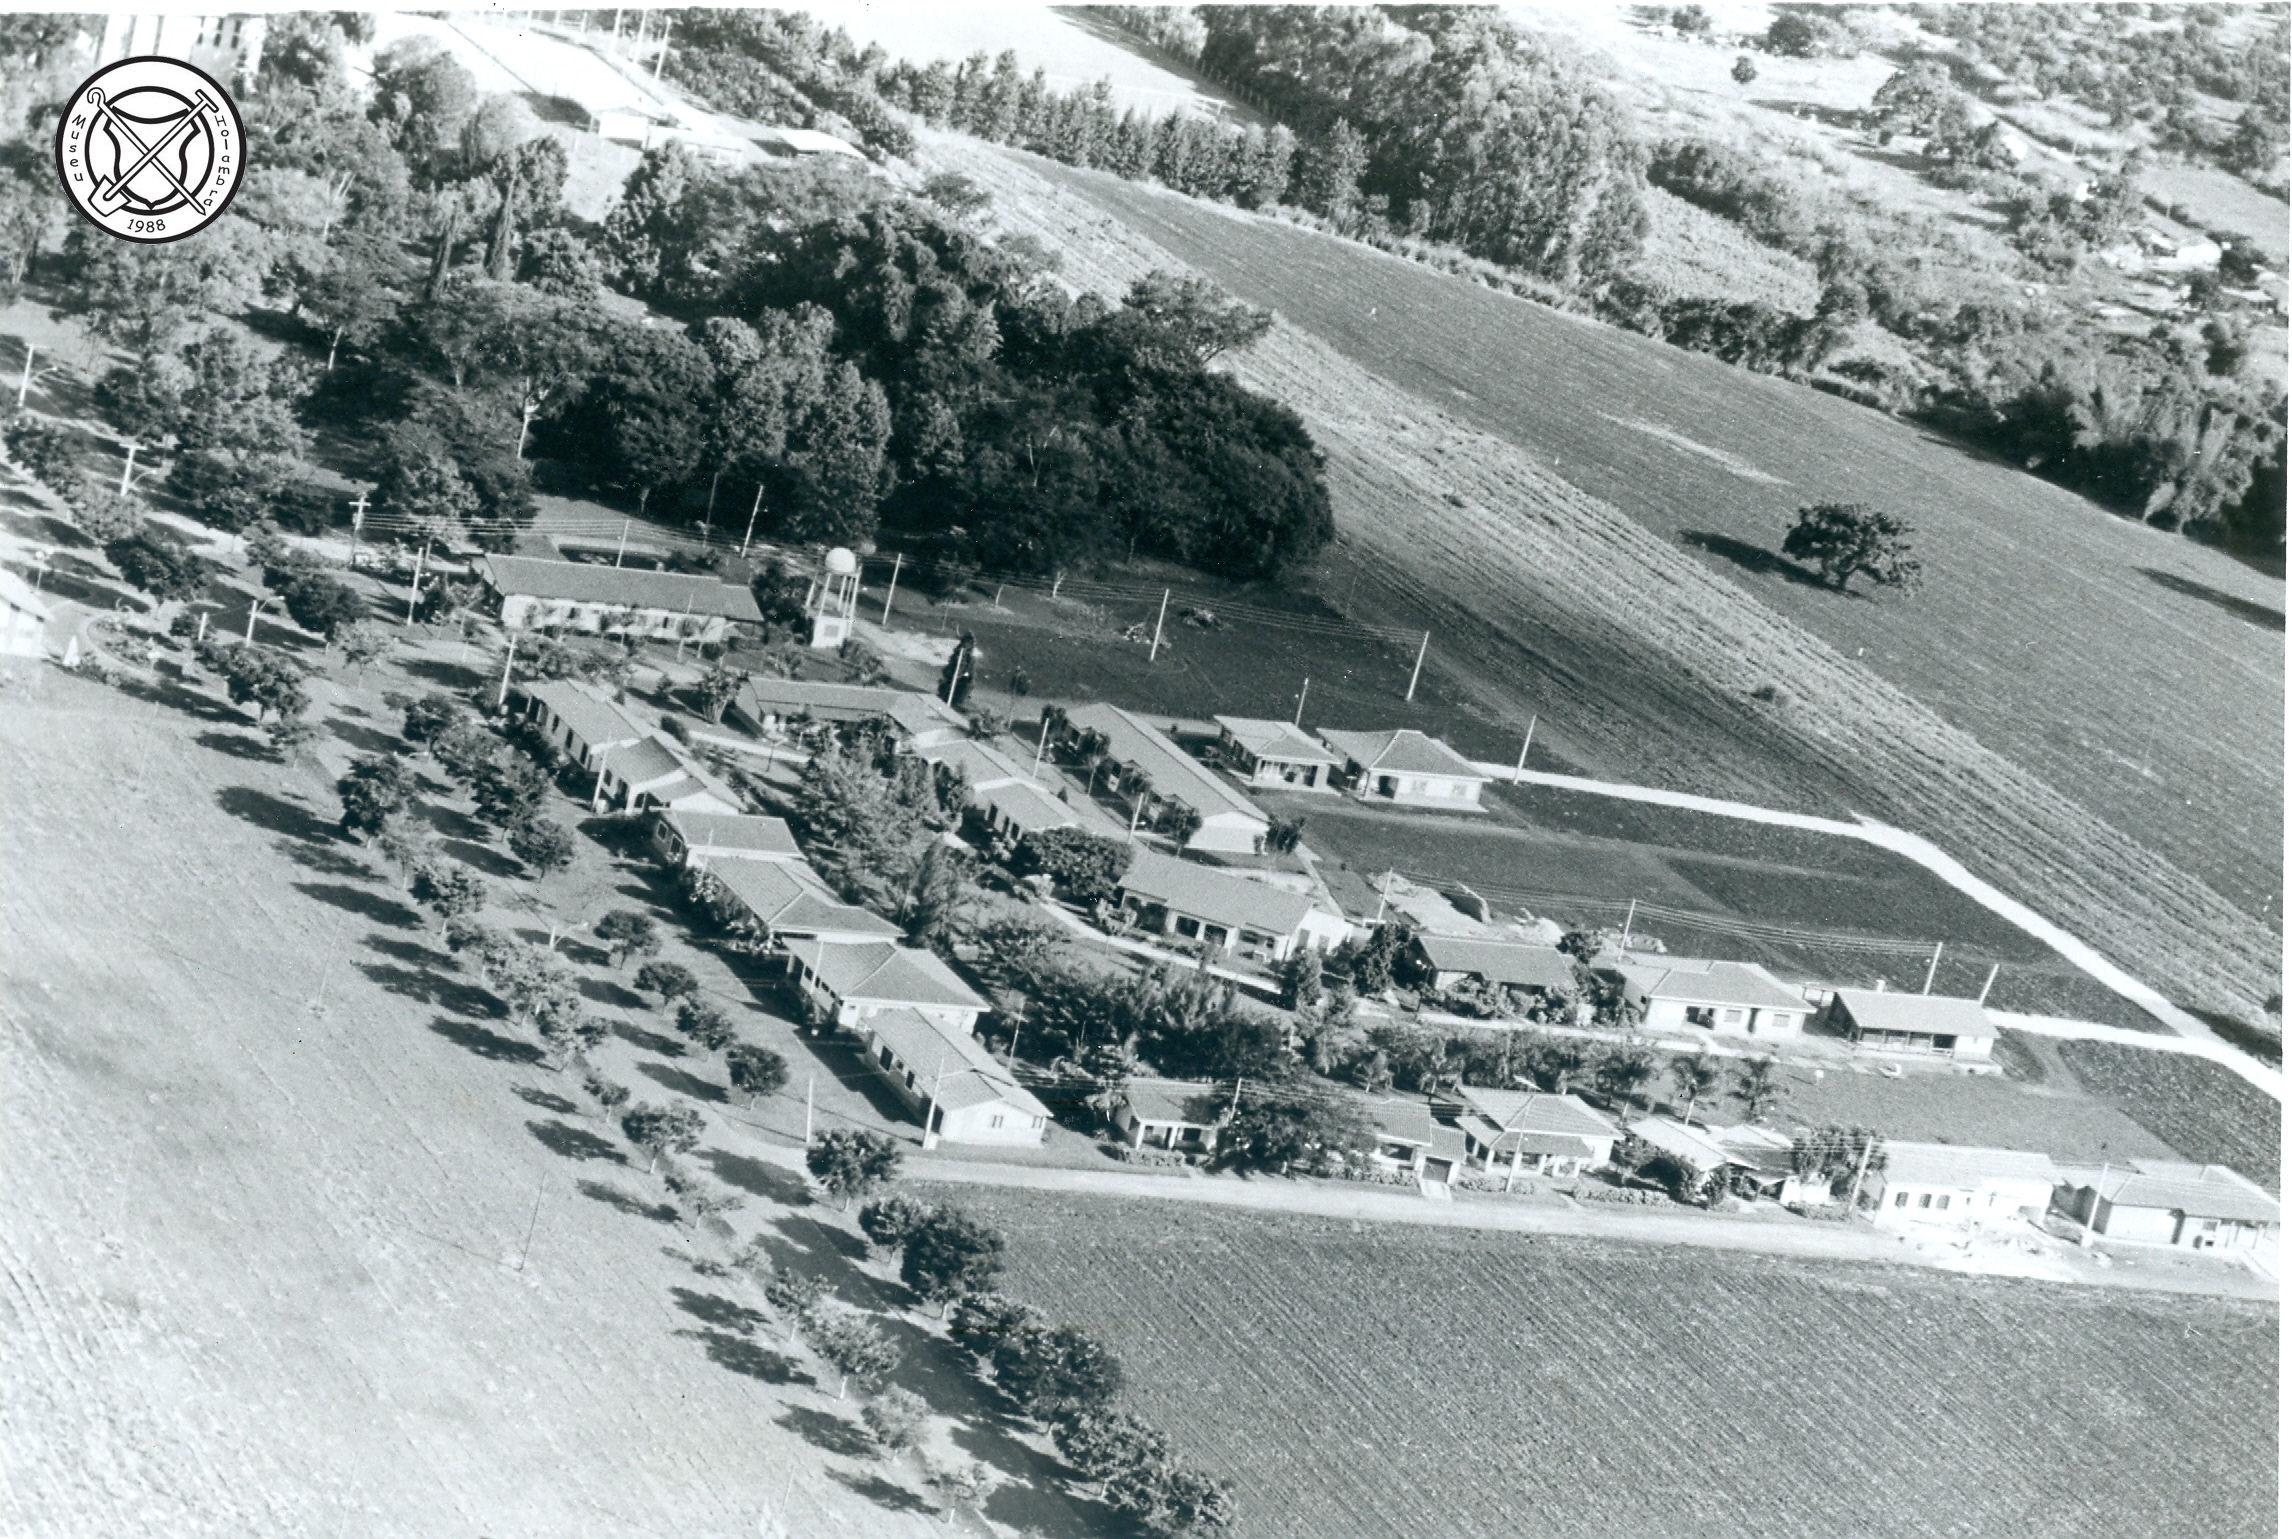 Luchtfoto van het Centro Social Holandês